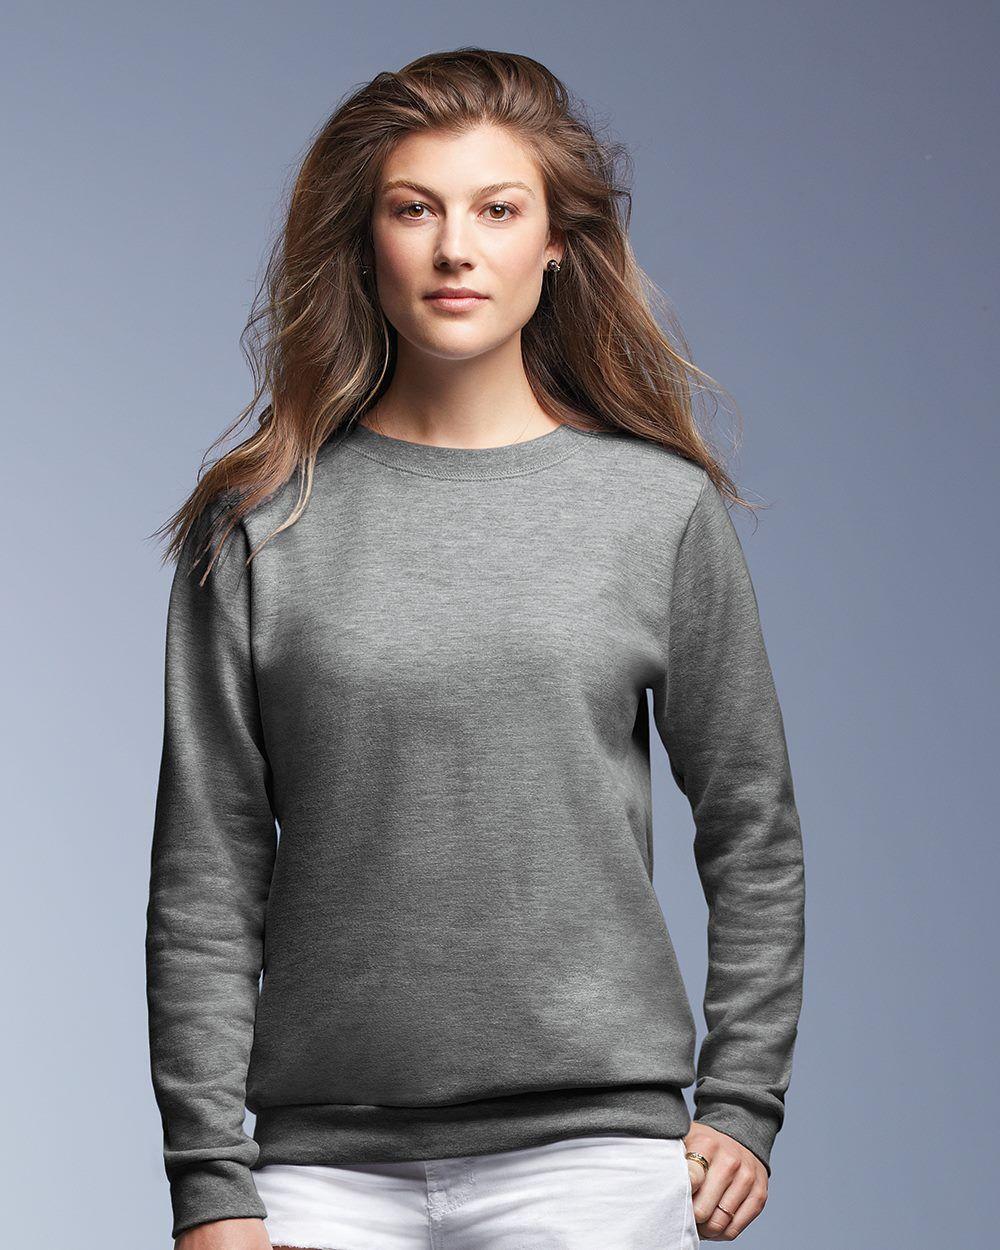 Anvil 71000FL Ladies' Crewneck Sweatshirt Wholesale and